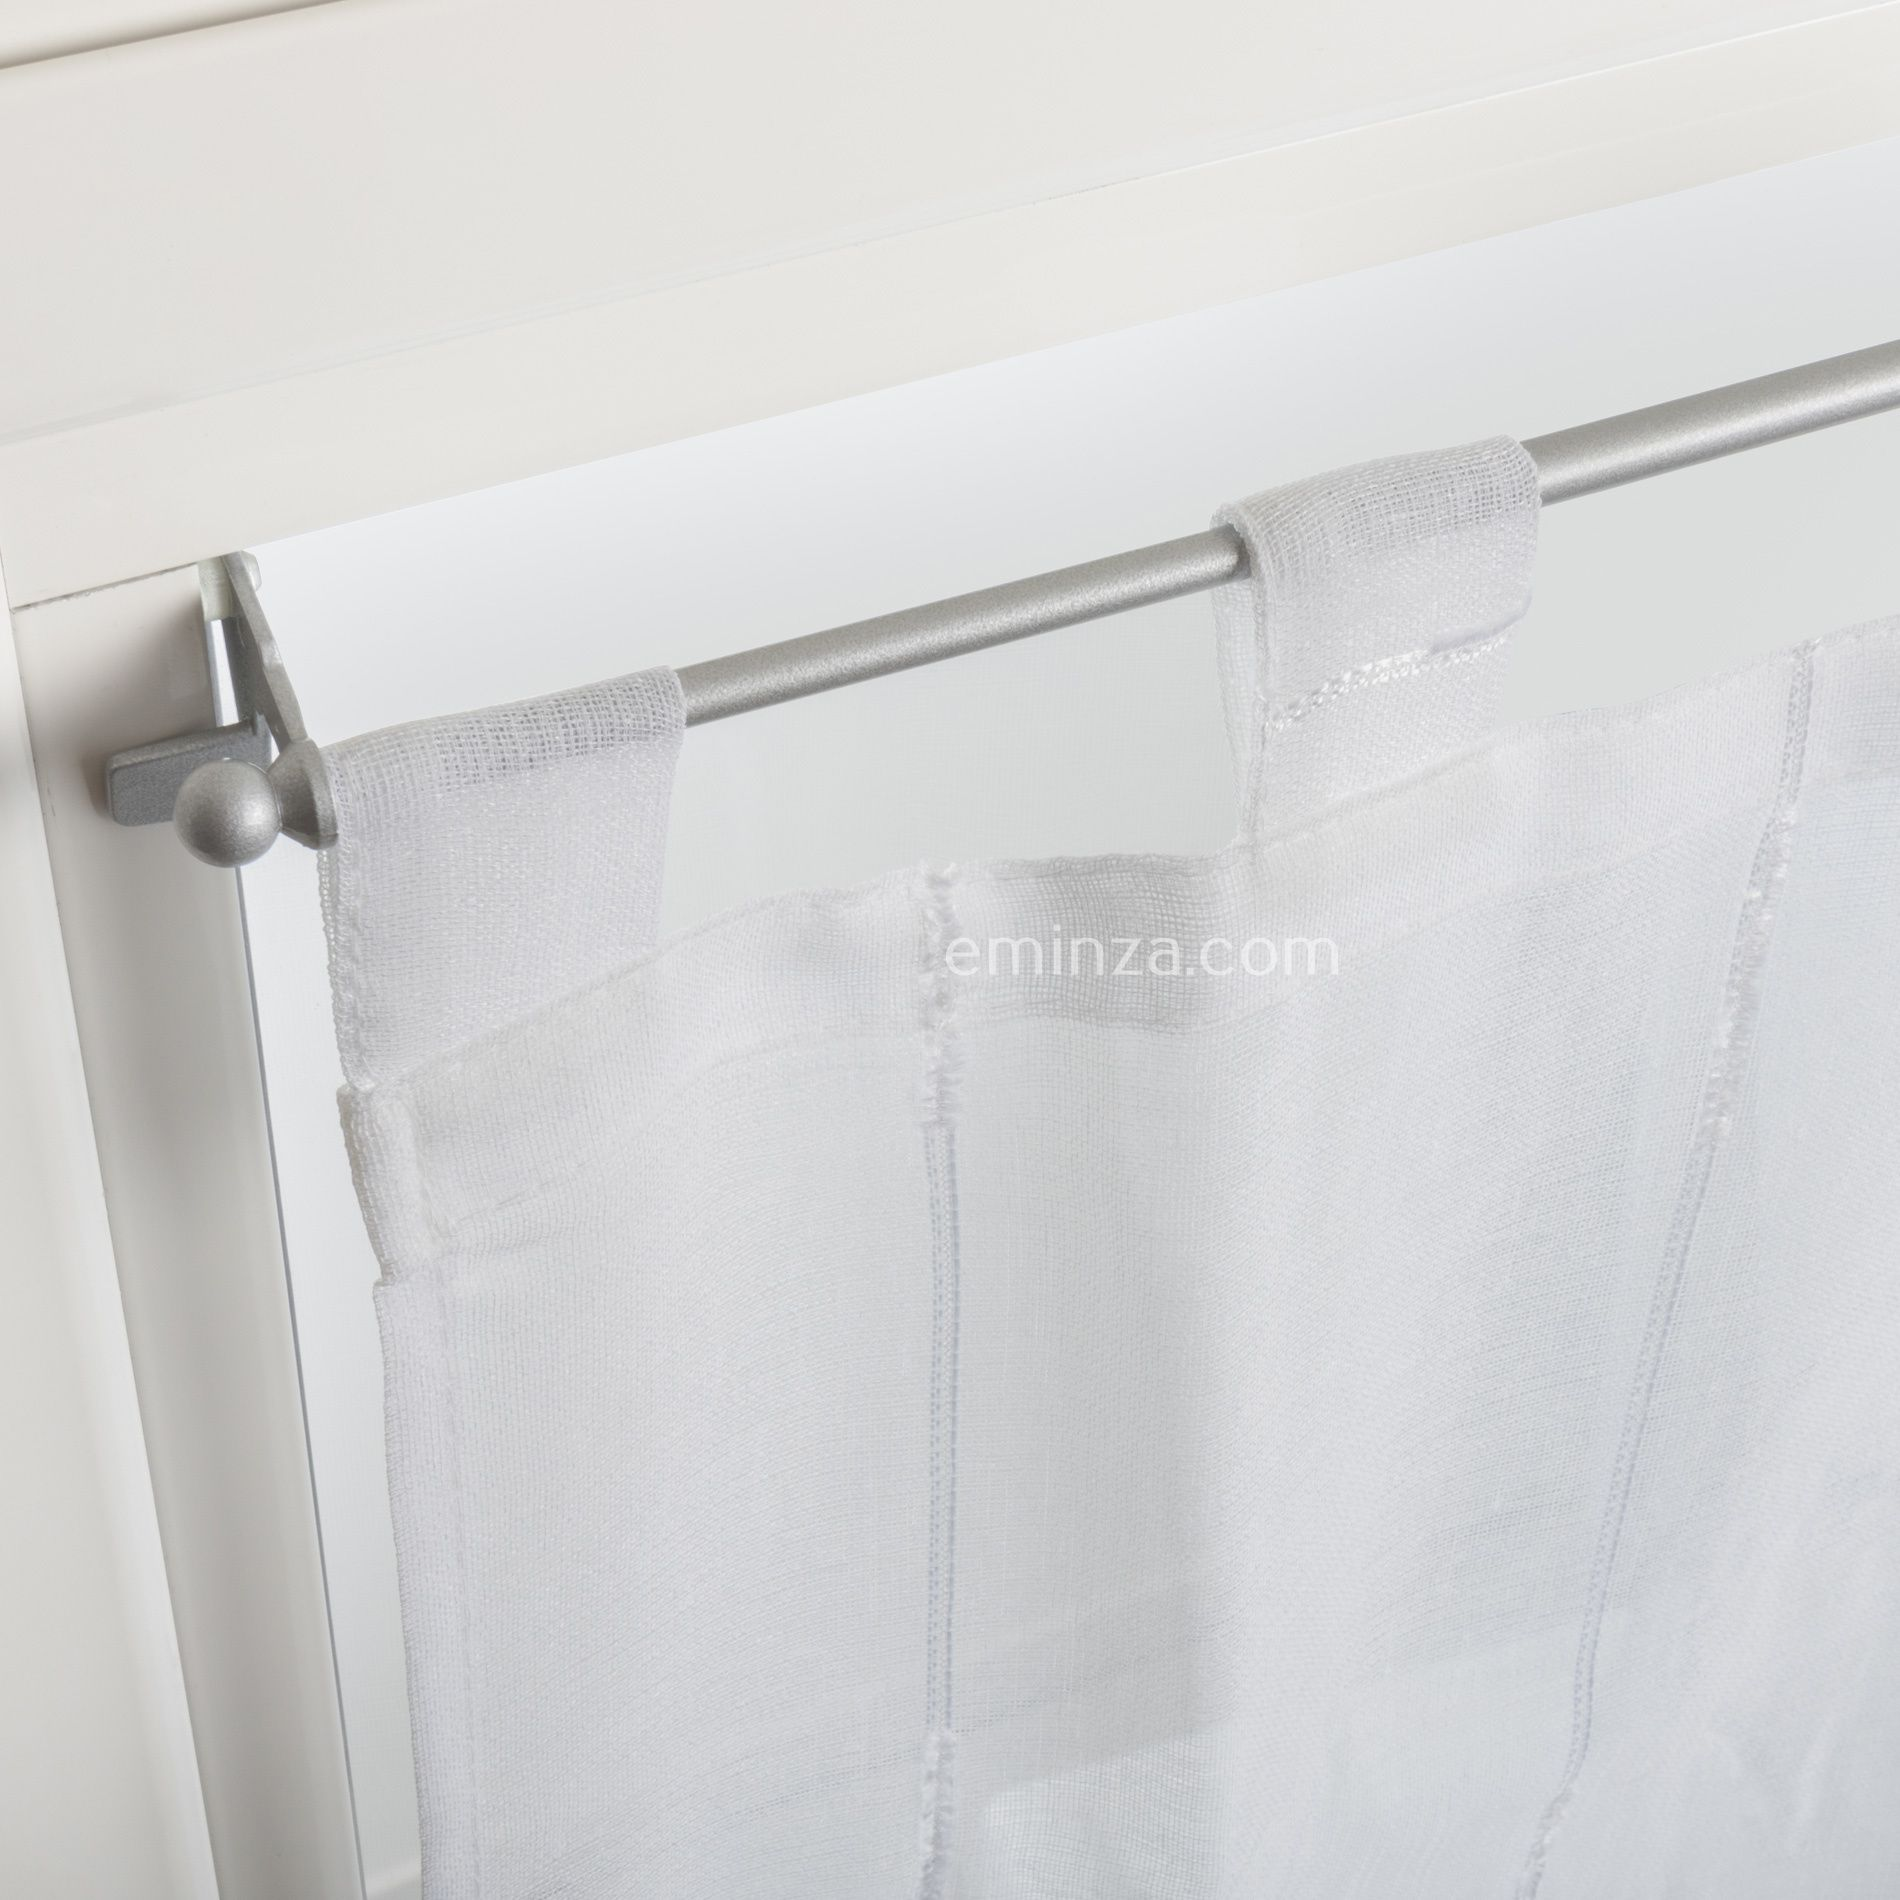 tringle fix 39 vit l80 cm argent tringle vitrage eminza. Black Bedroom Furniture Sets. Home Design Ideas